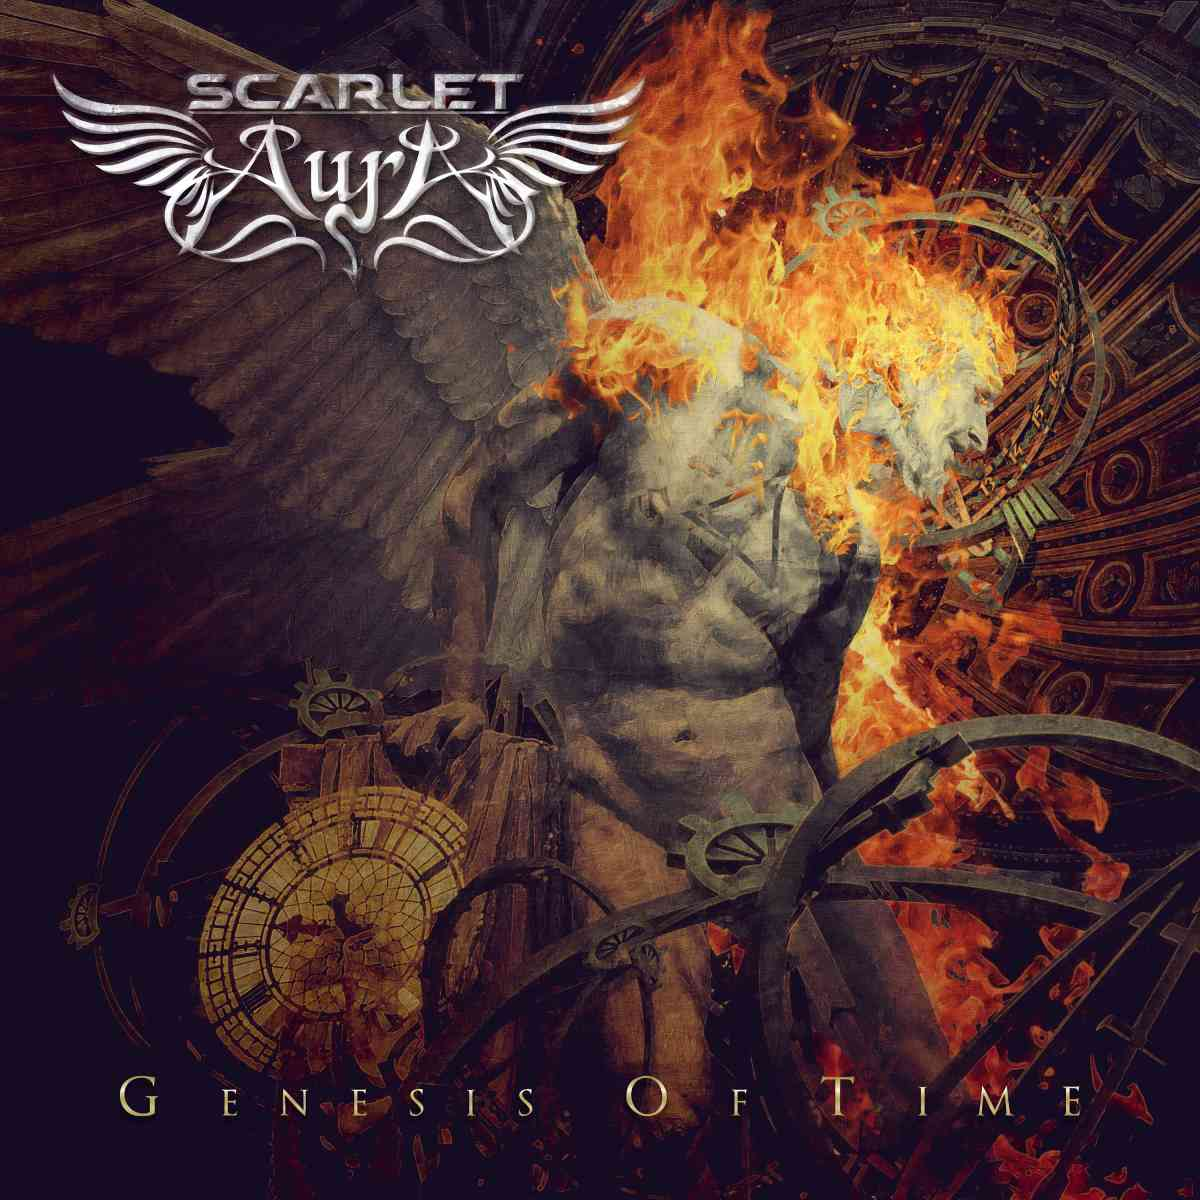 scarlet aura - genesis of time - album cover